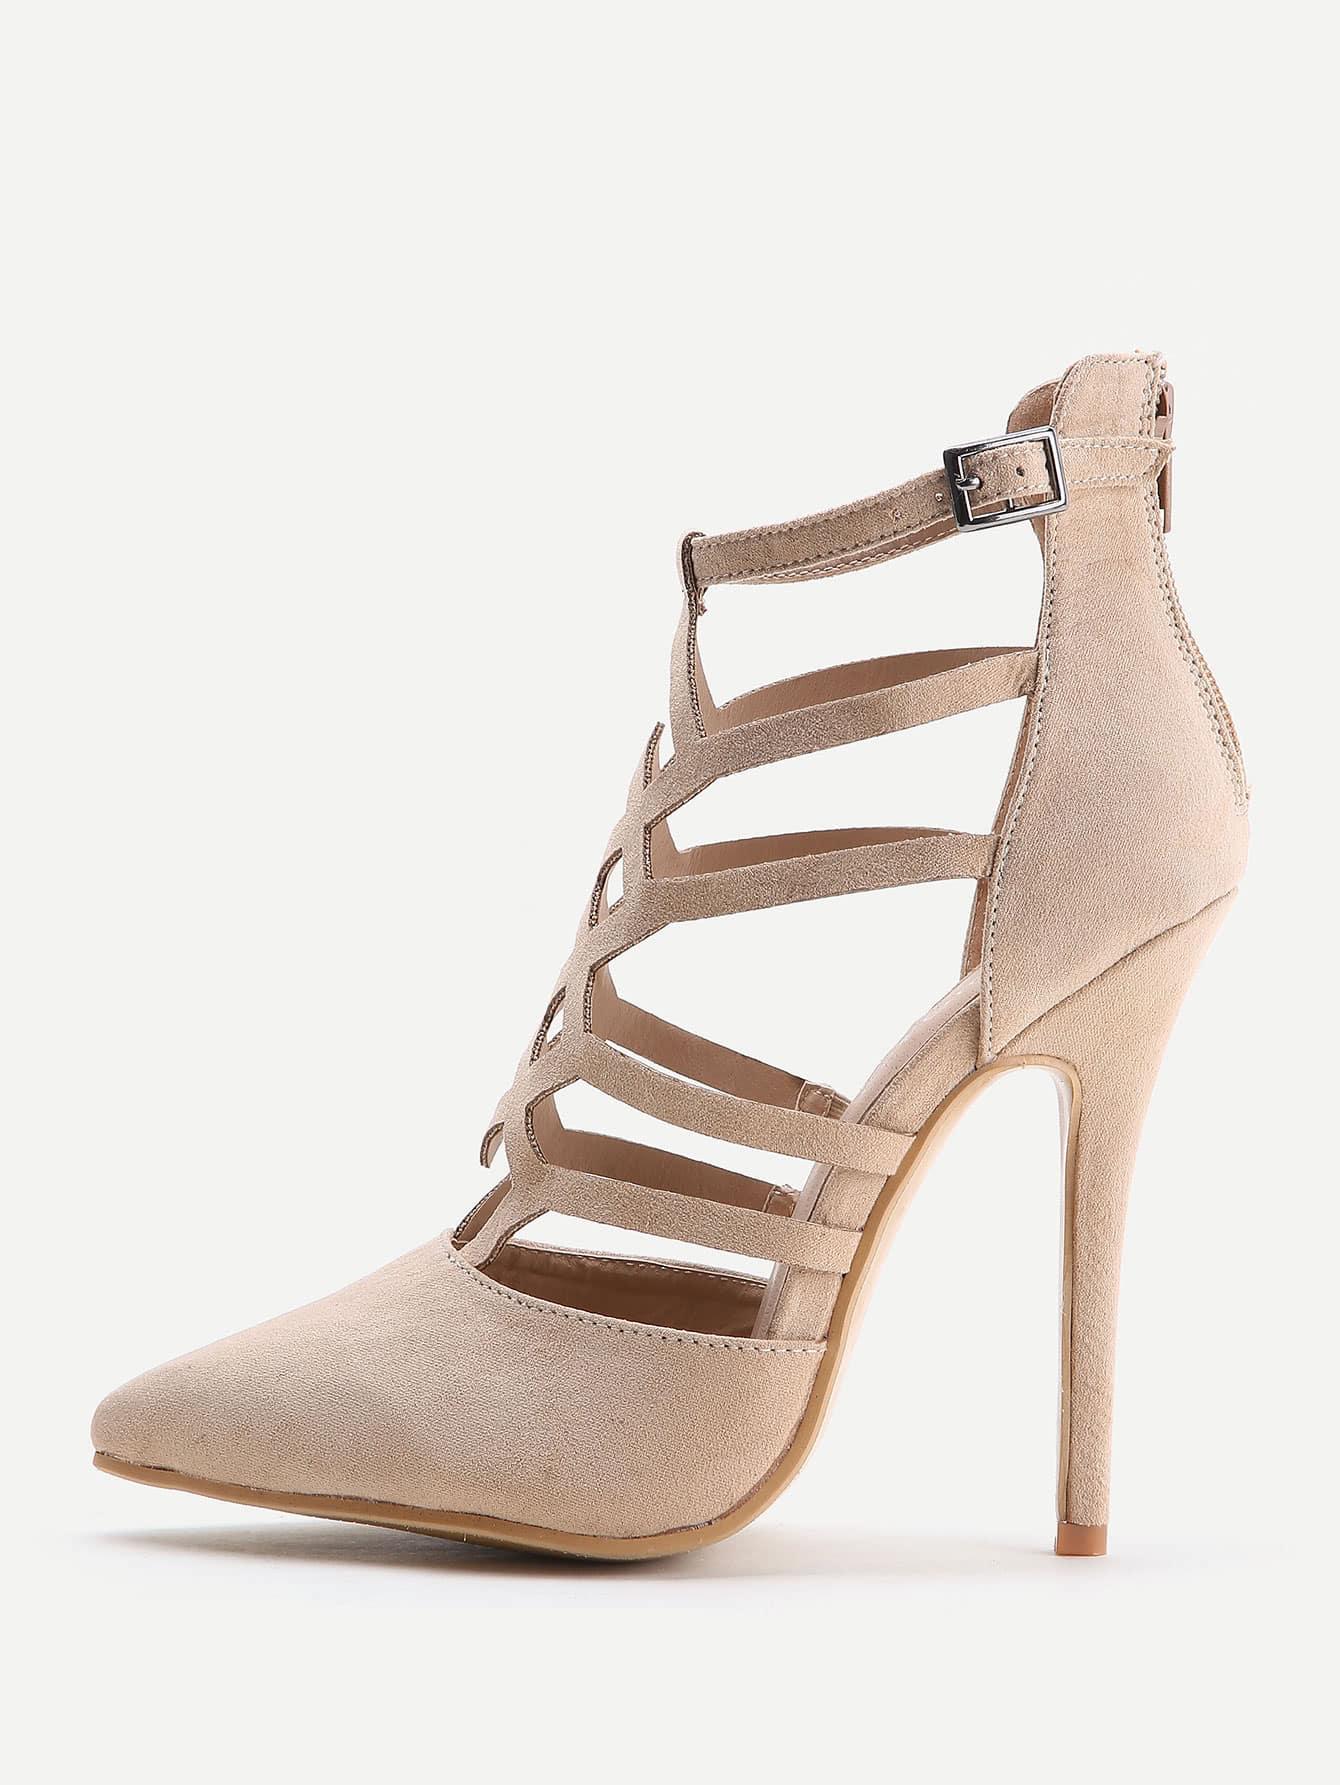 Фото Apricot Cutout Zipper Back Stiletto Heels. Купить с доставкой